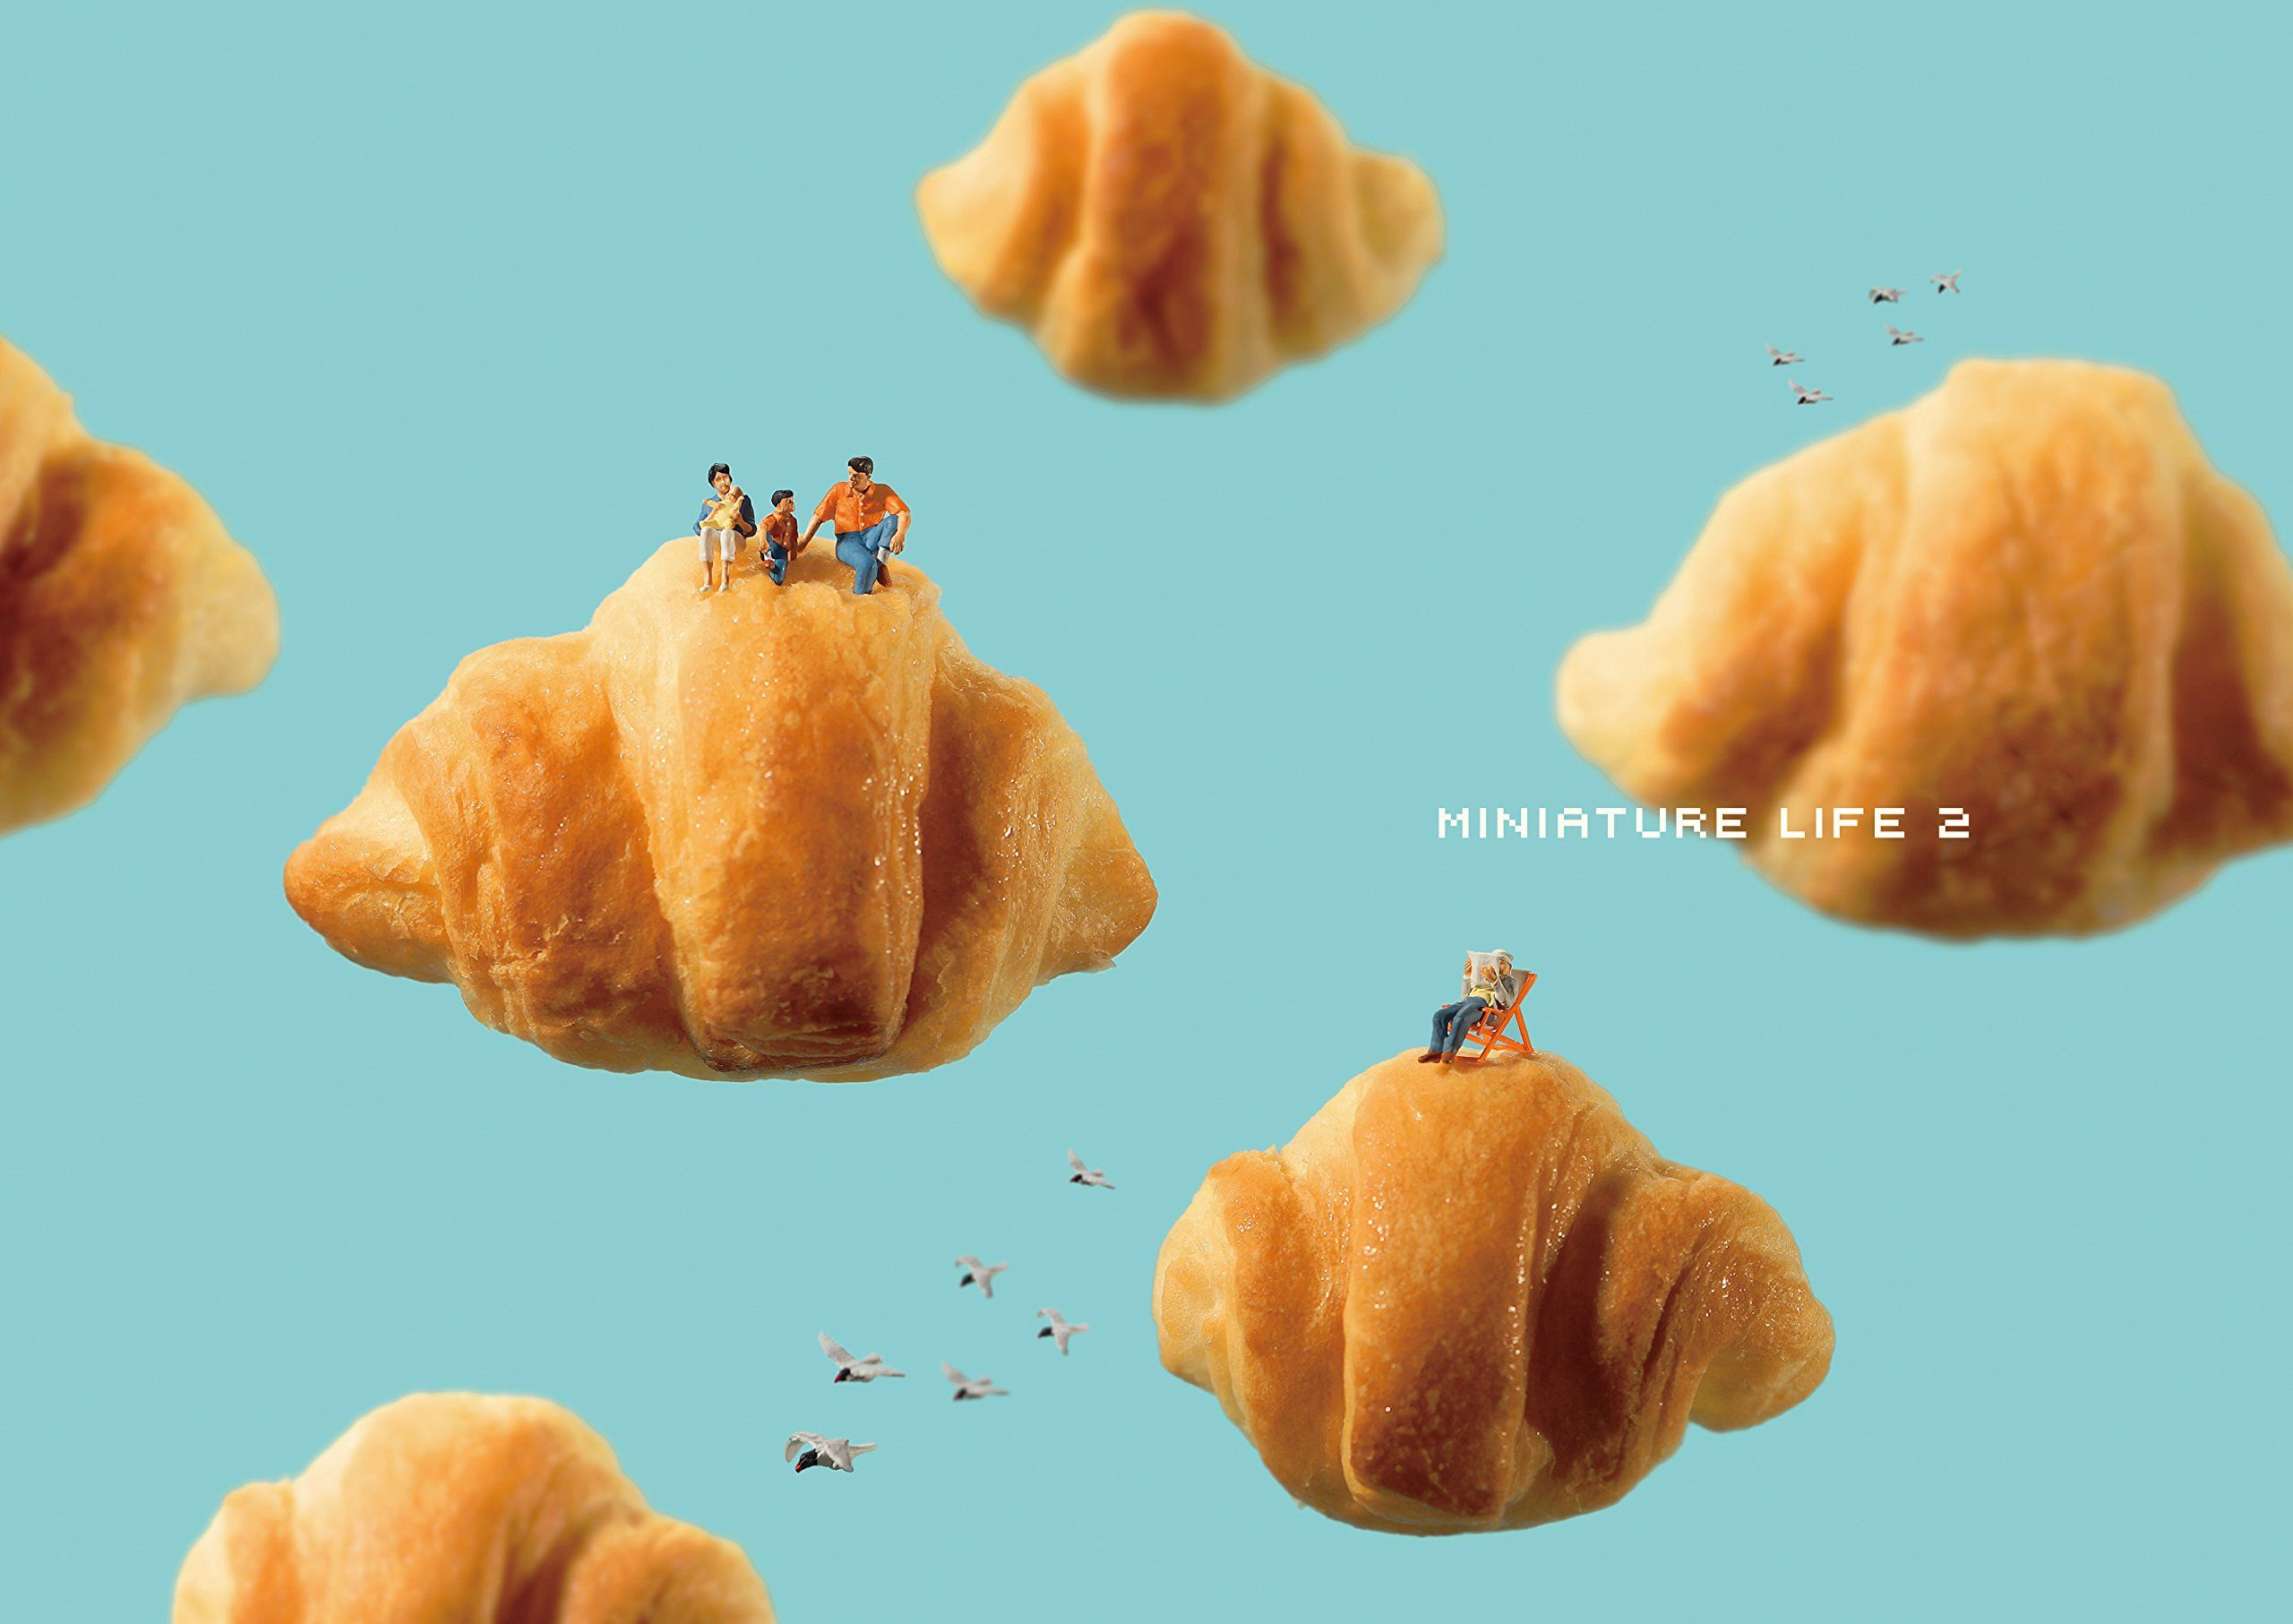 MINIATURE LIFE 2 Miniature Life 2 | MINIATURE CALENDAR | Books | mail order | Amazon